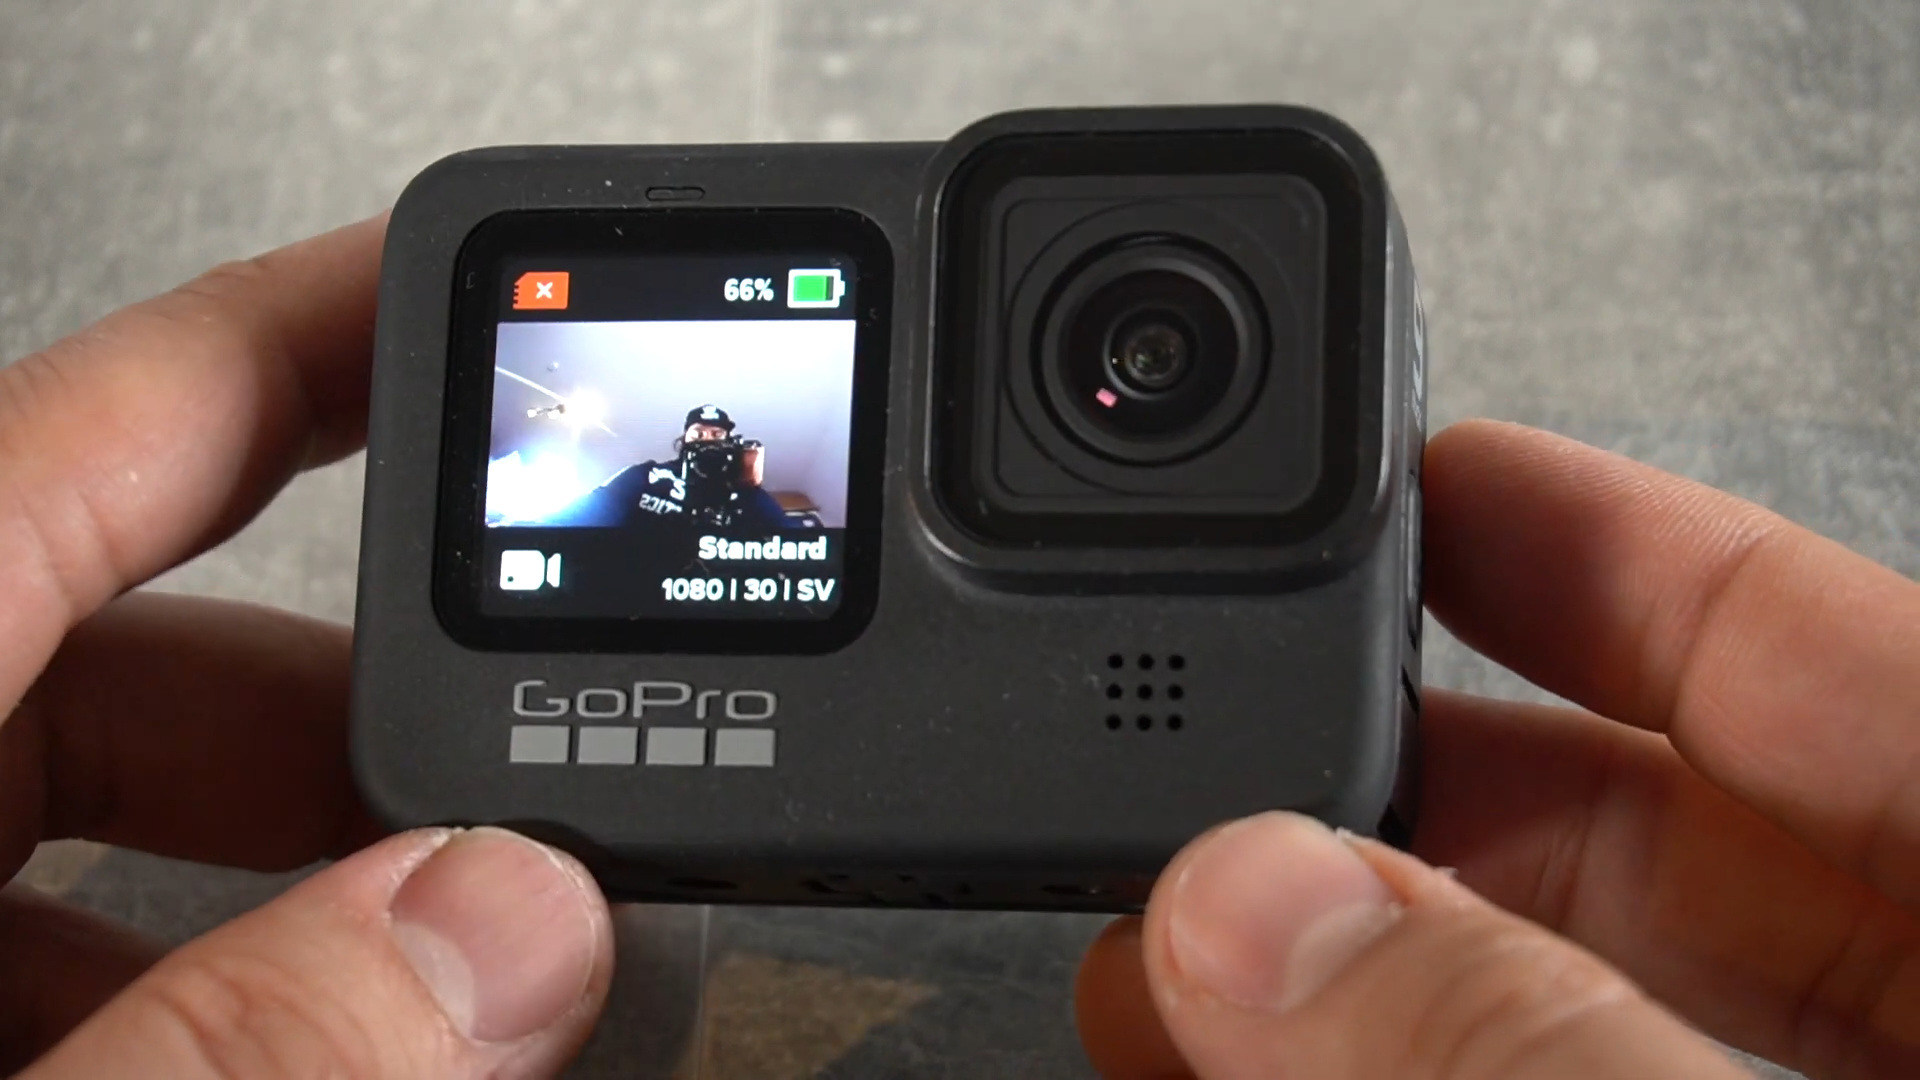 Test, Kamera, NewGadgets, Johannes Knapp, GoPro, Actioncam, Actionkamera, Action-Kamera, GoPro Hero 9 Black, GoPro Hero9, GoPro Hero9 Black, GoPro Hero, Gopro Hero 9